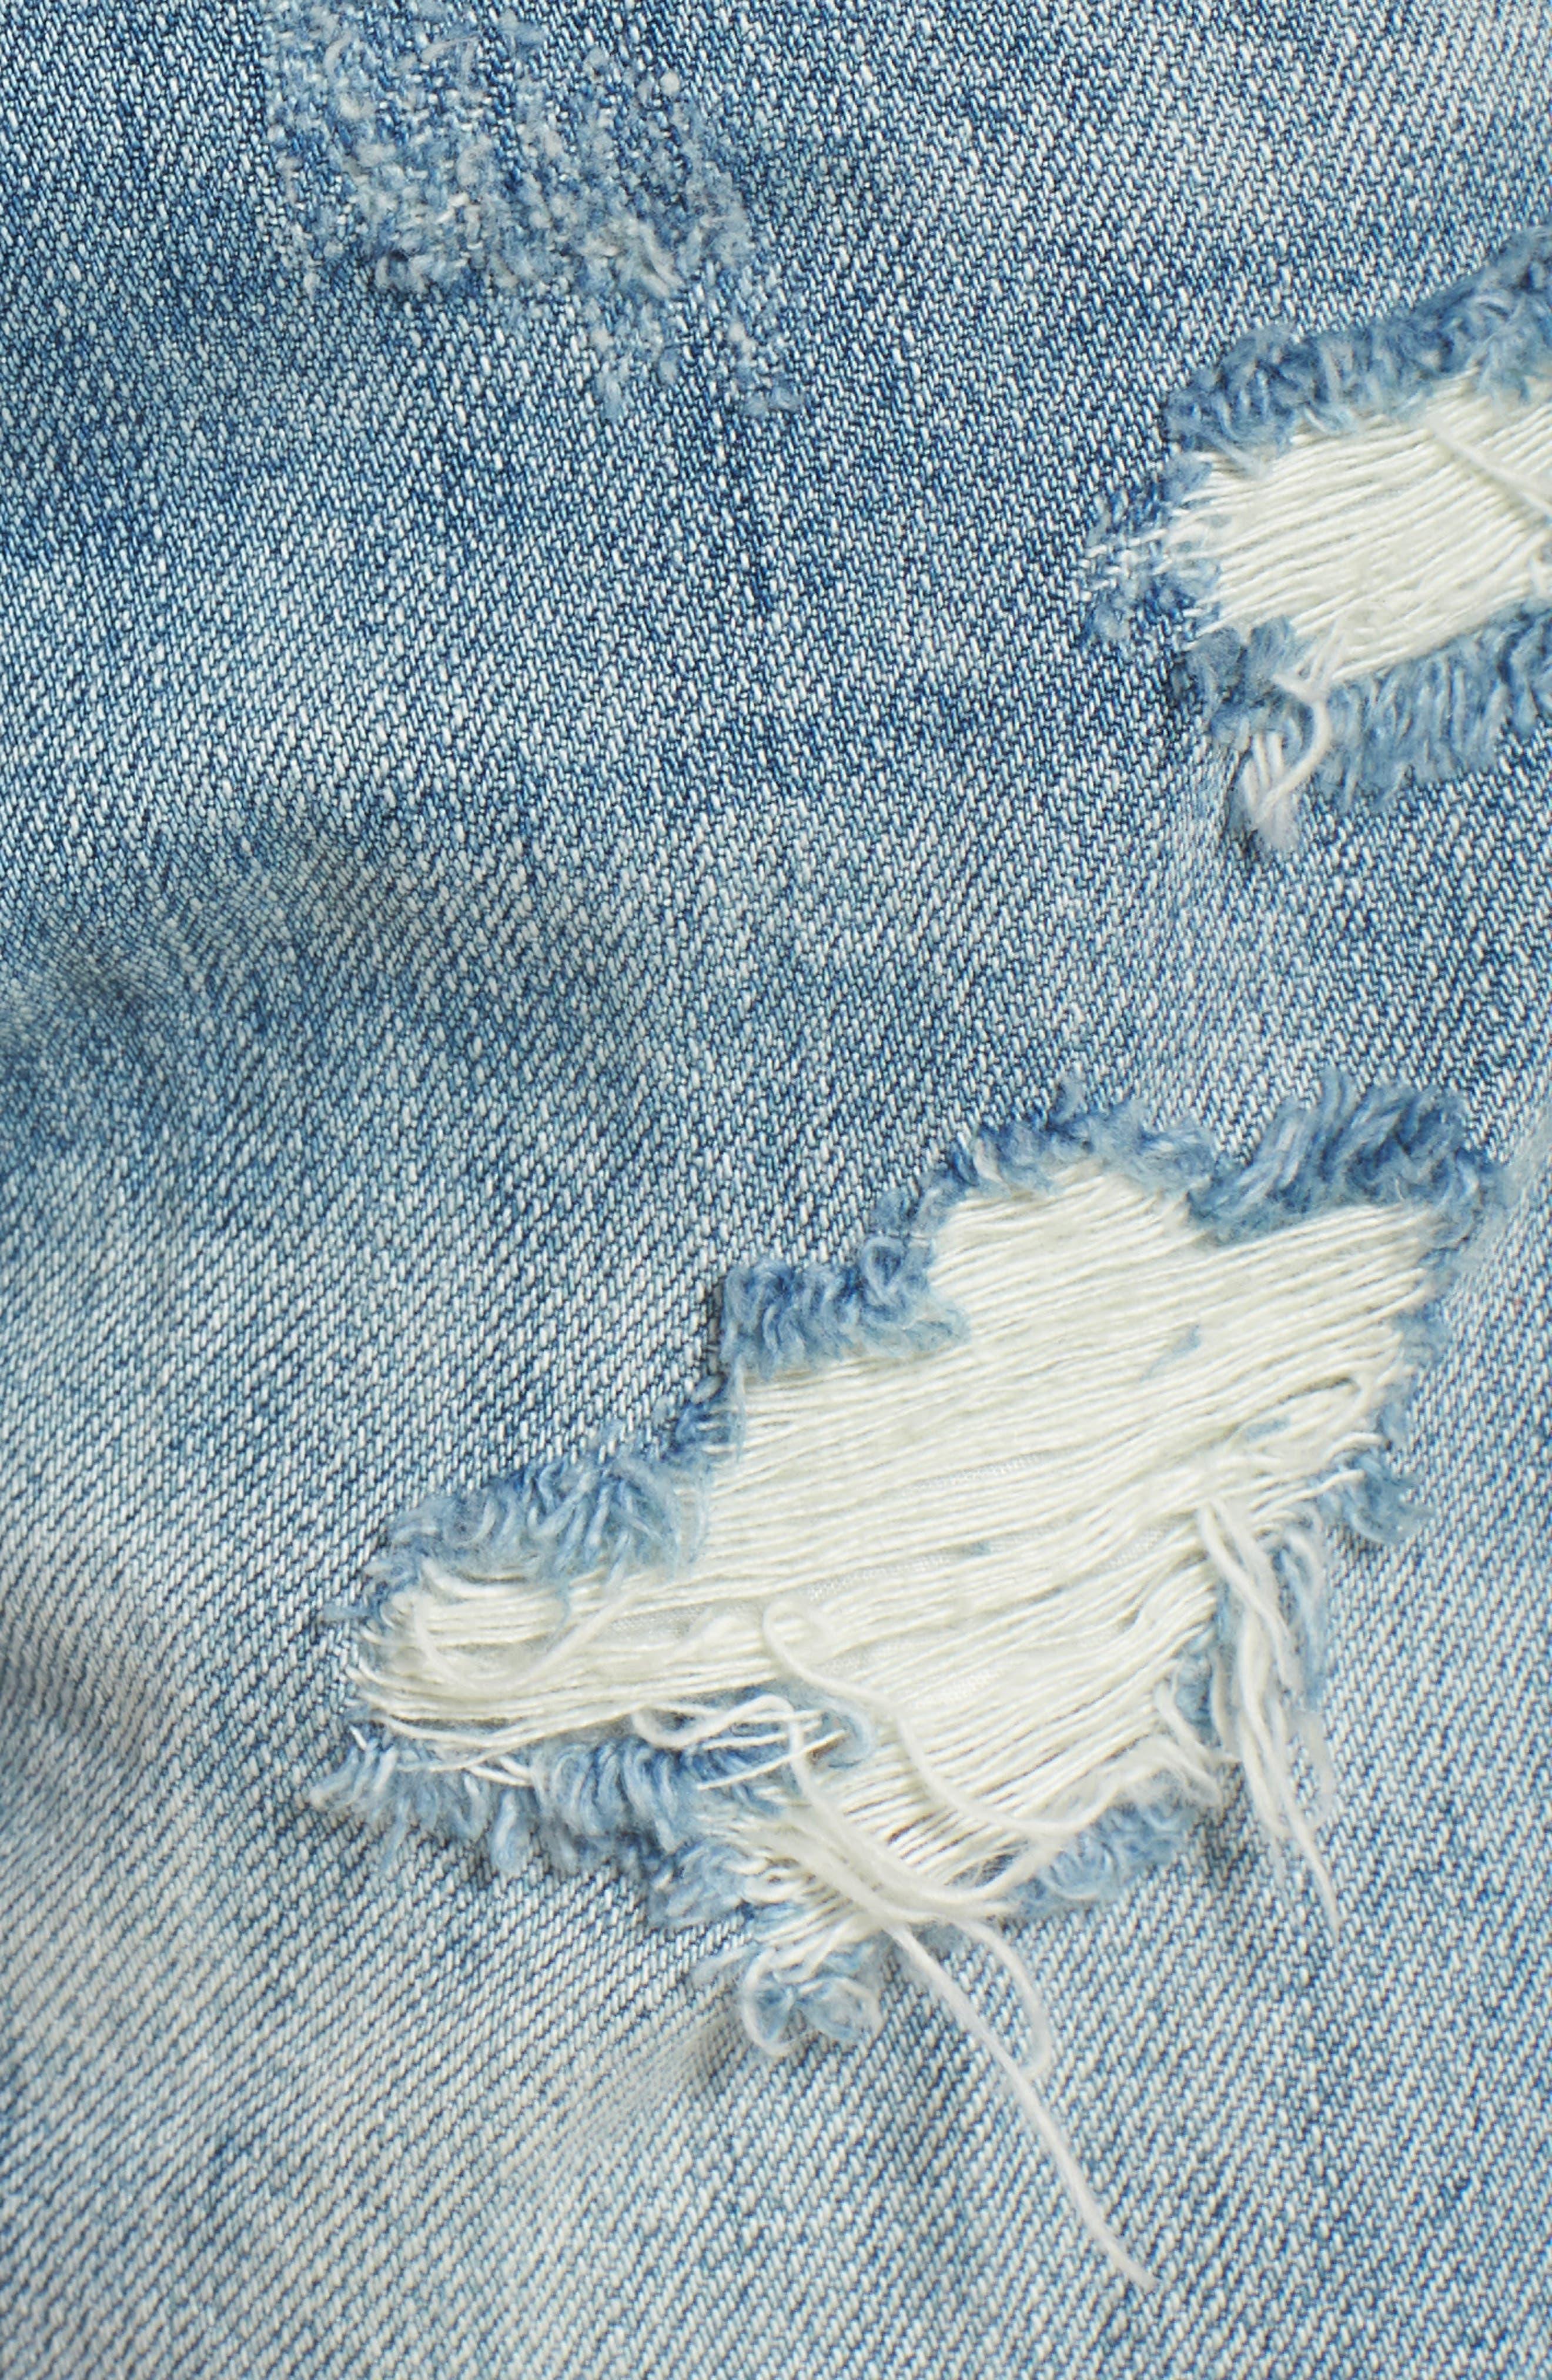 Panic Prevention Ripped Cutoff Denim Shorts,                             Alternate thumbnail 5, color,                             Blue